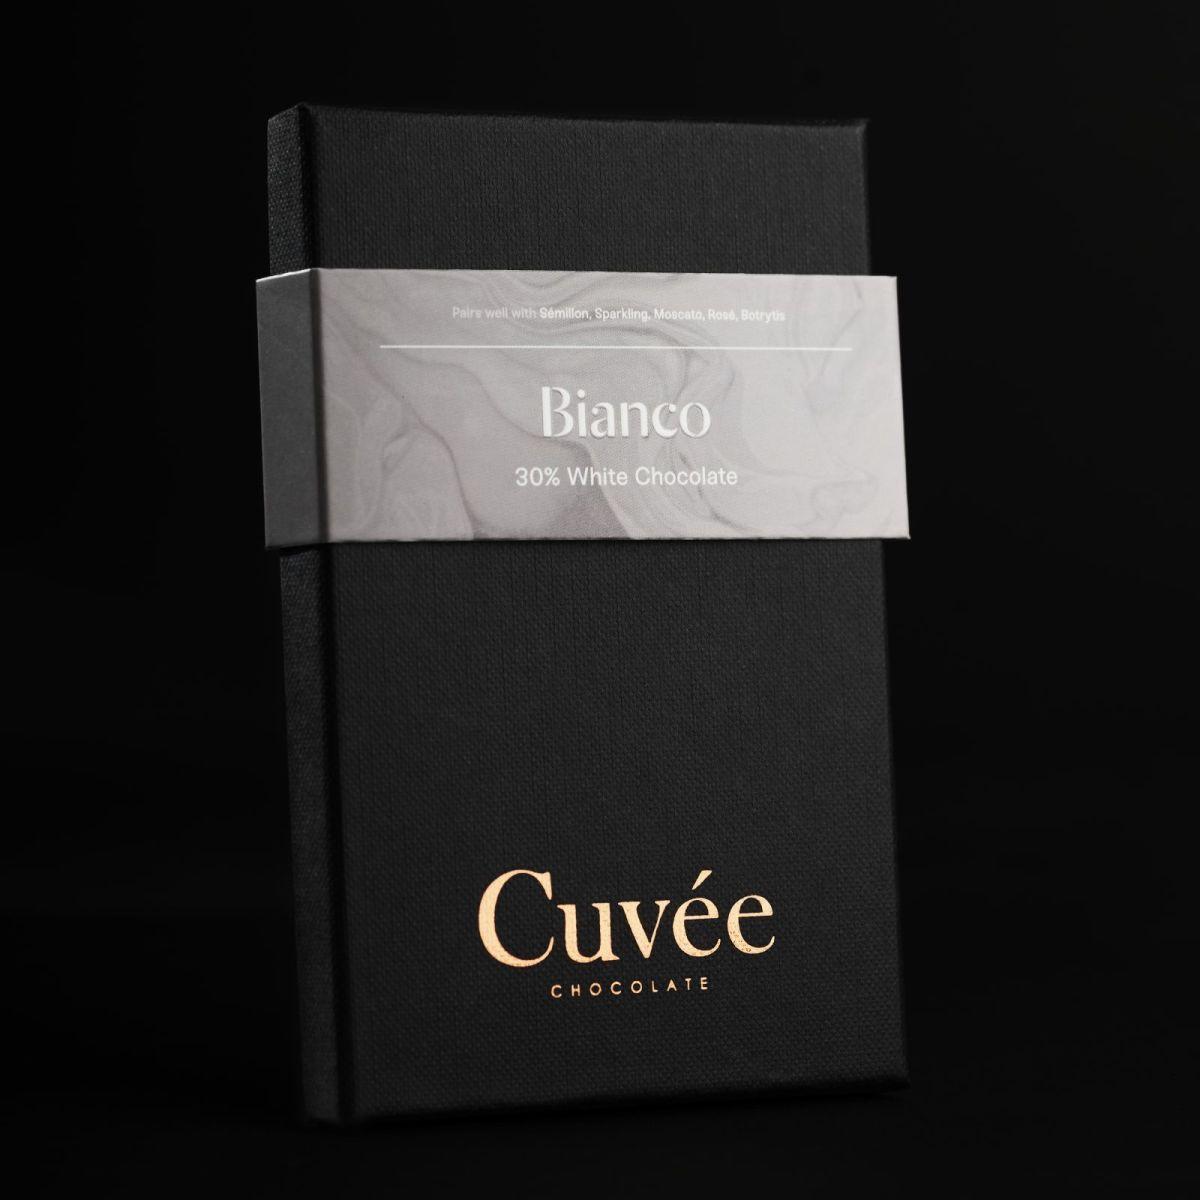 Cuvée Chocolate - Bianco 35% White Chocolate